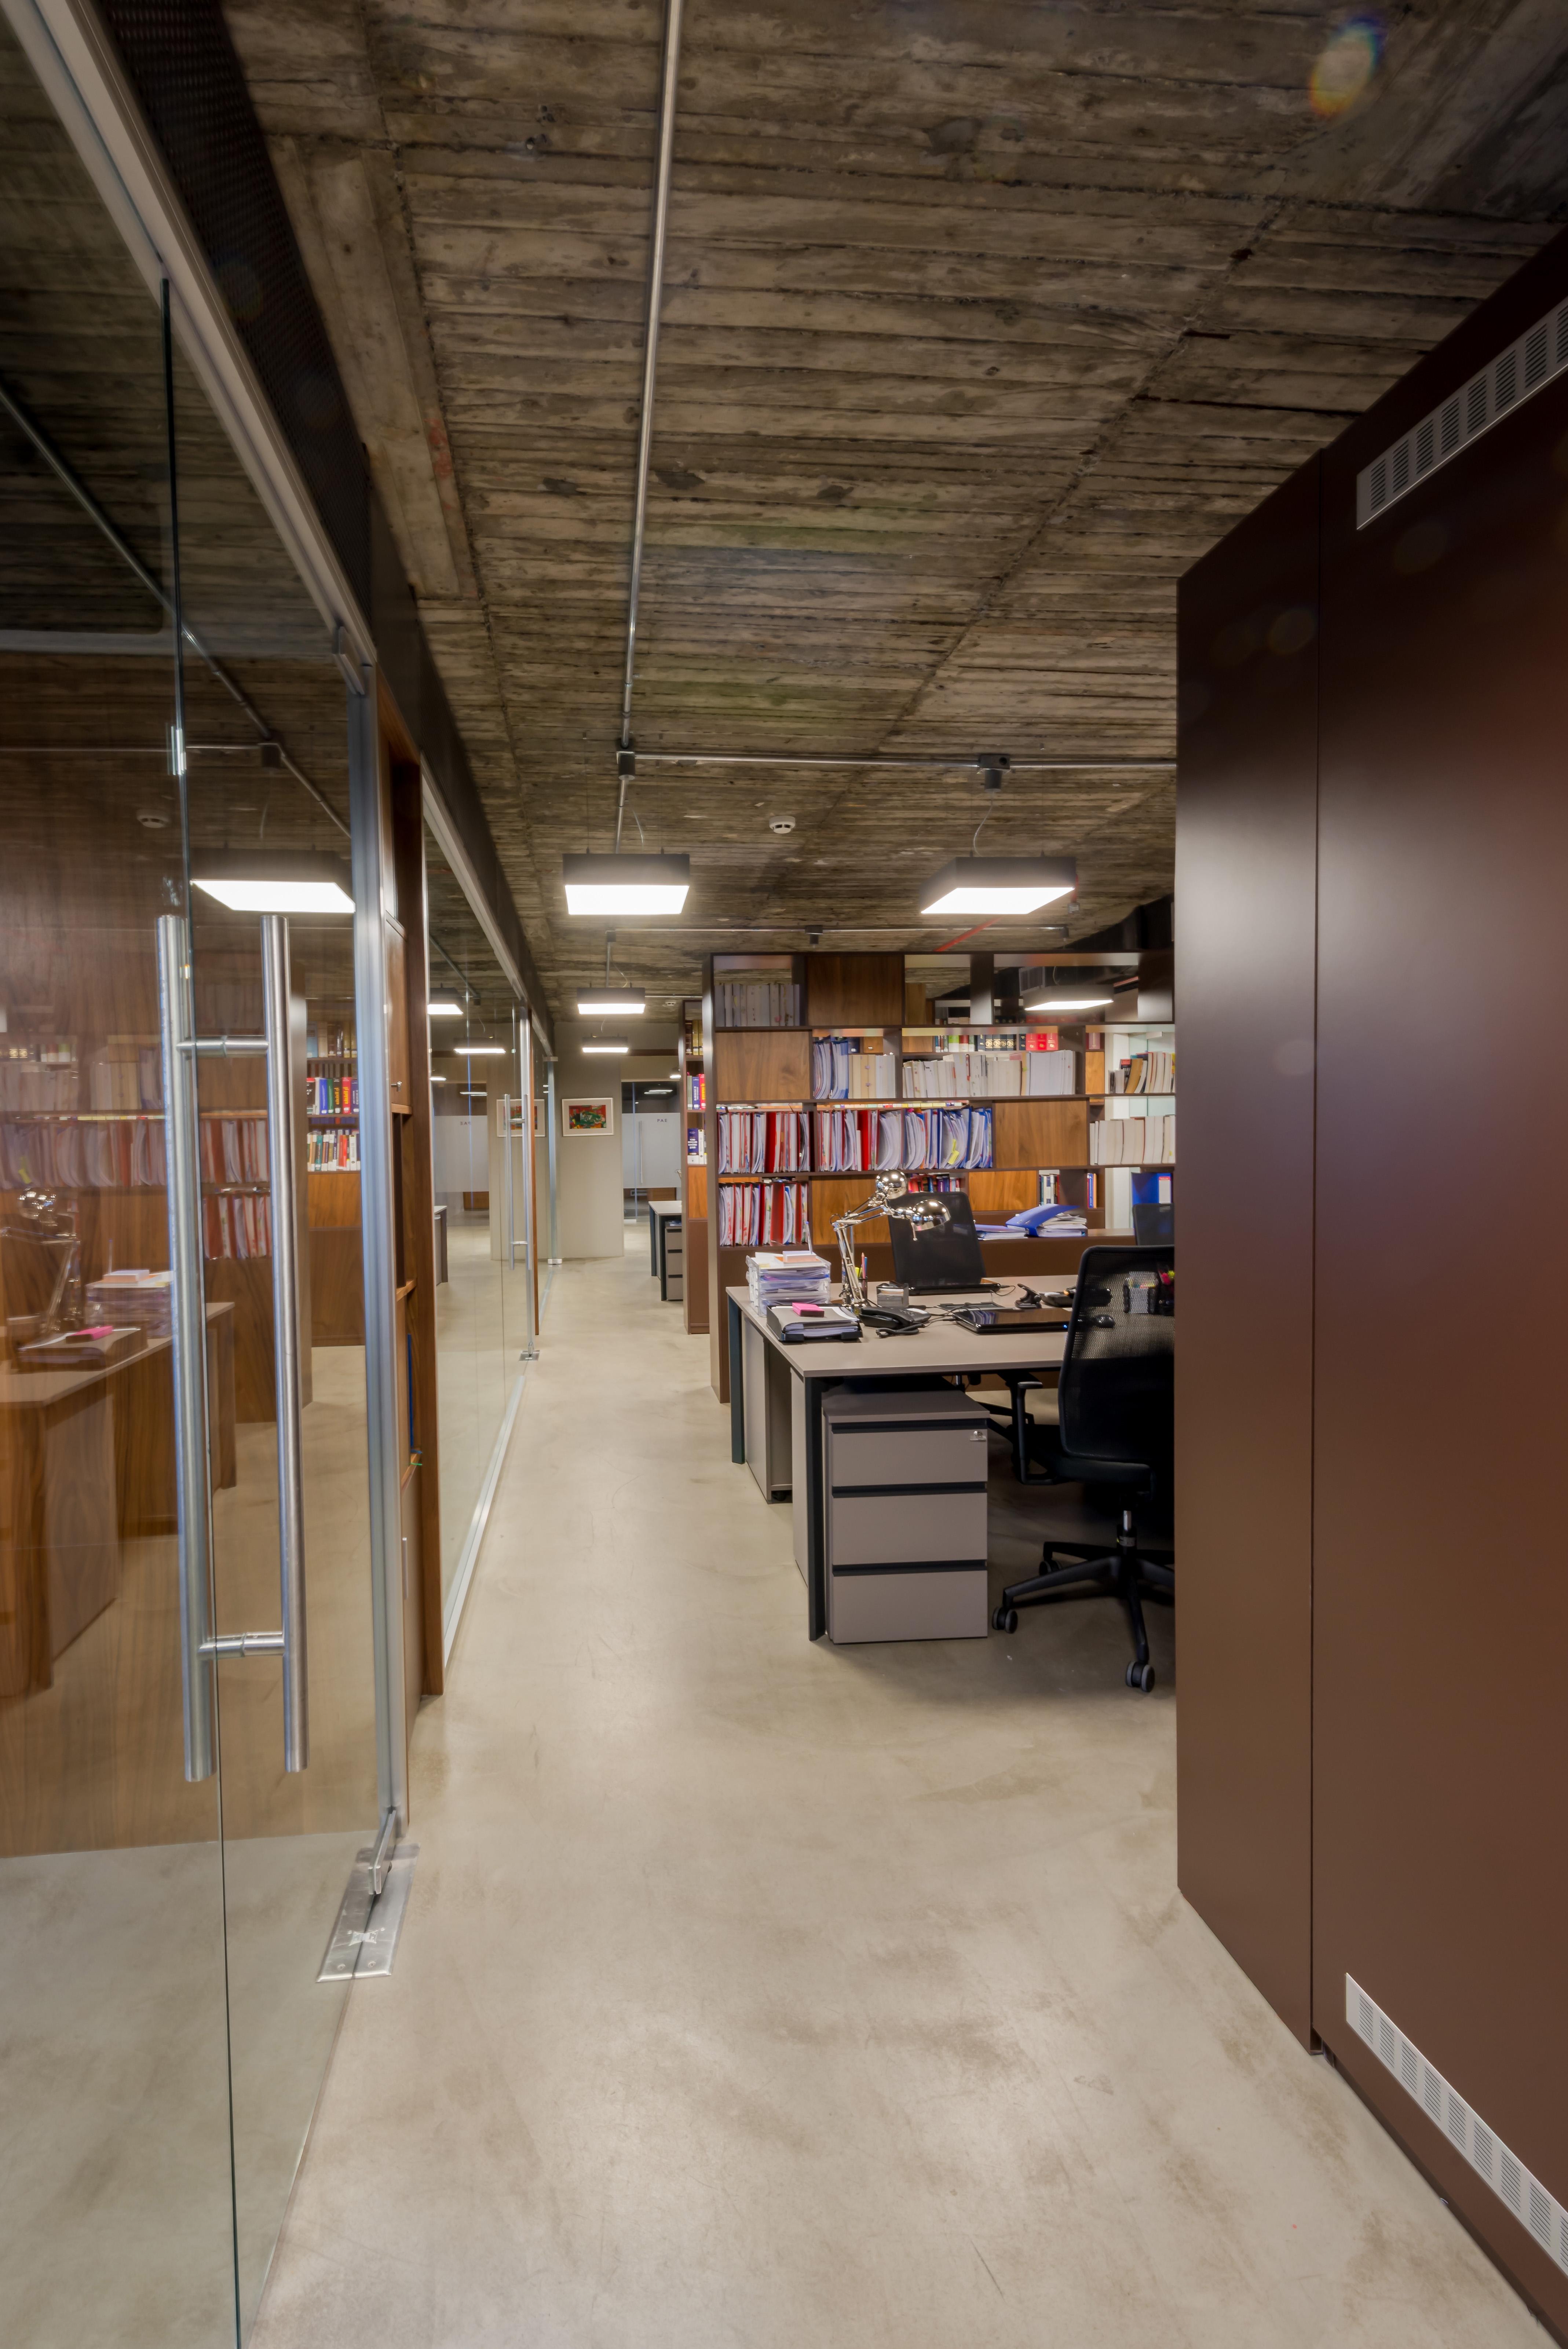 Dila+Gokalp+Architects+-+PAE+Law+Office+-+Calisma+99